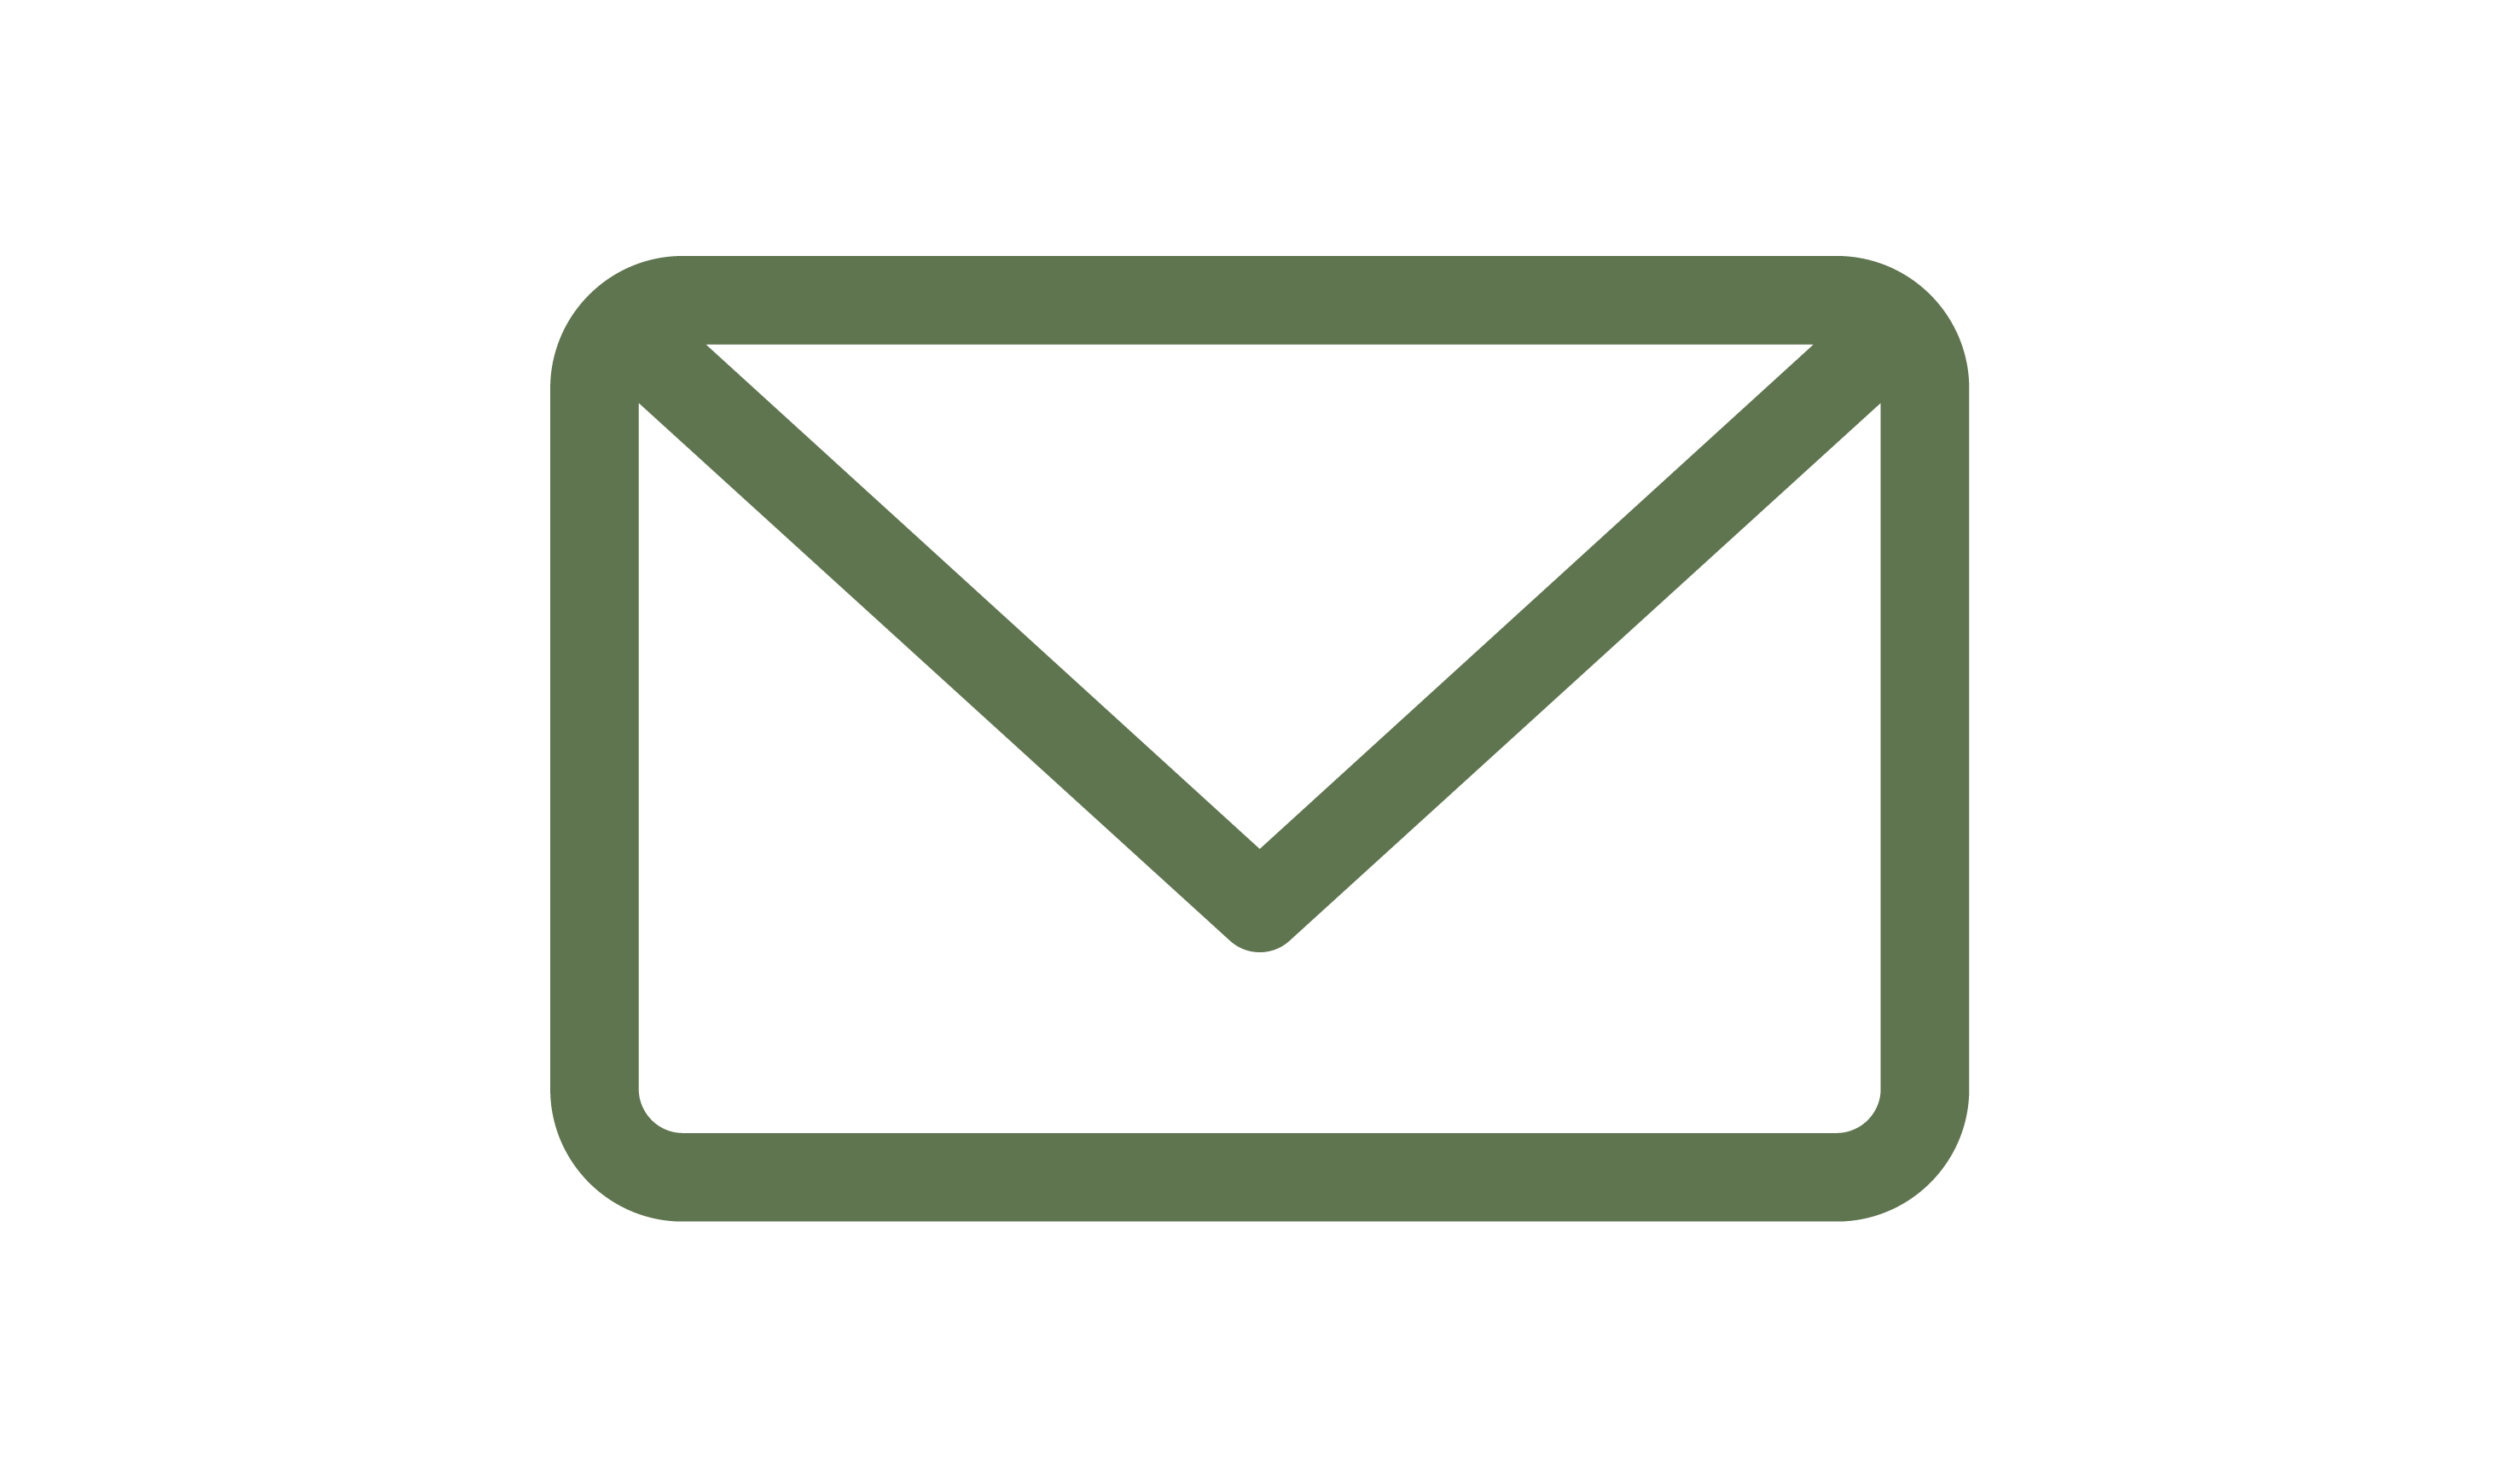 Mail Kontakt